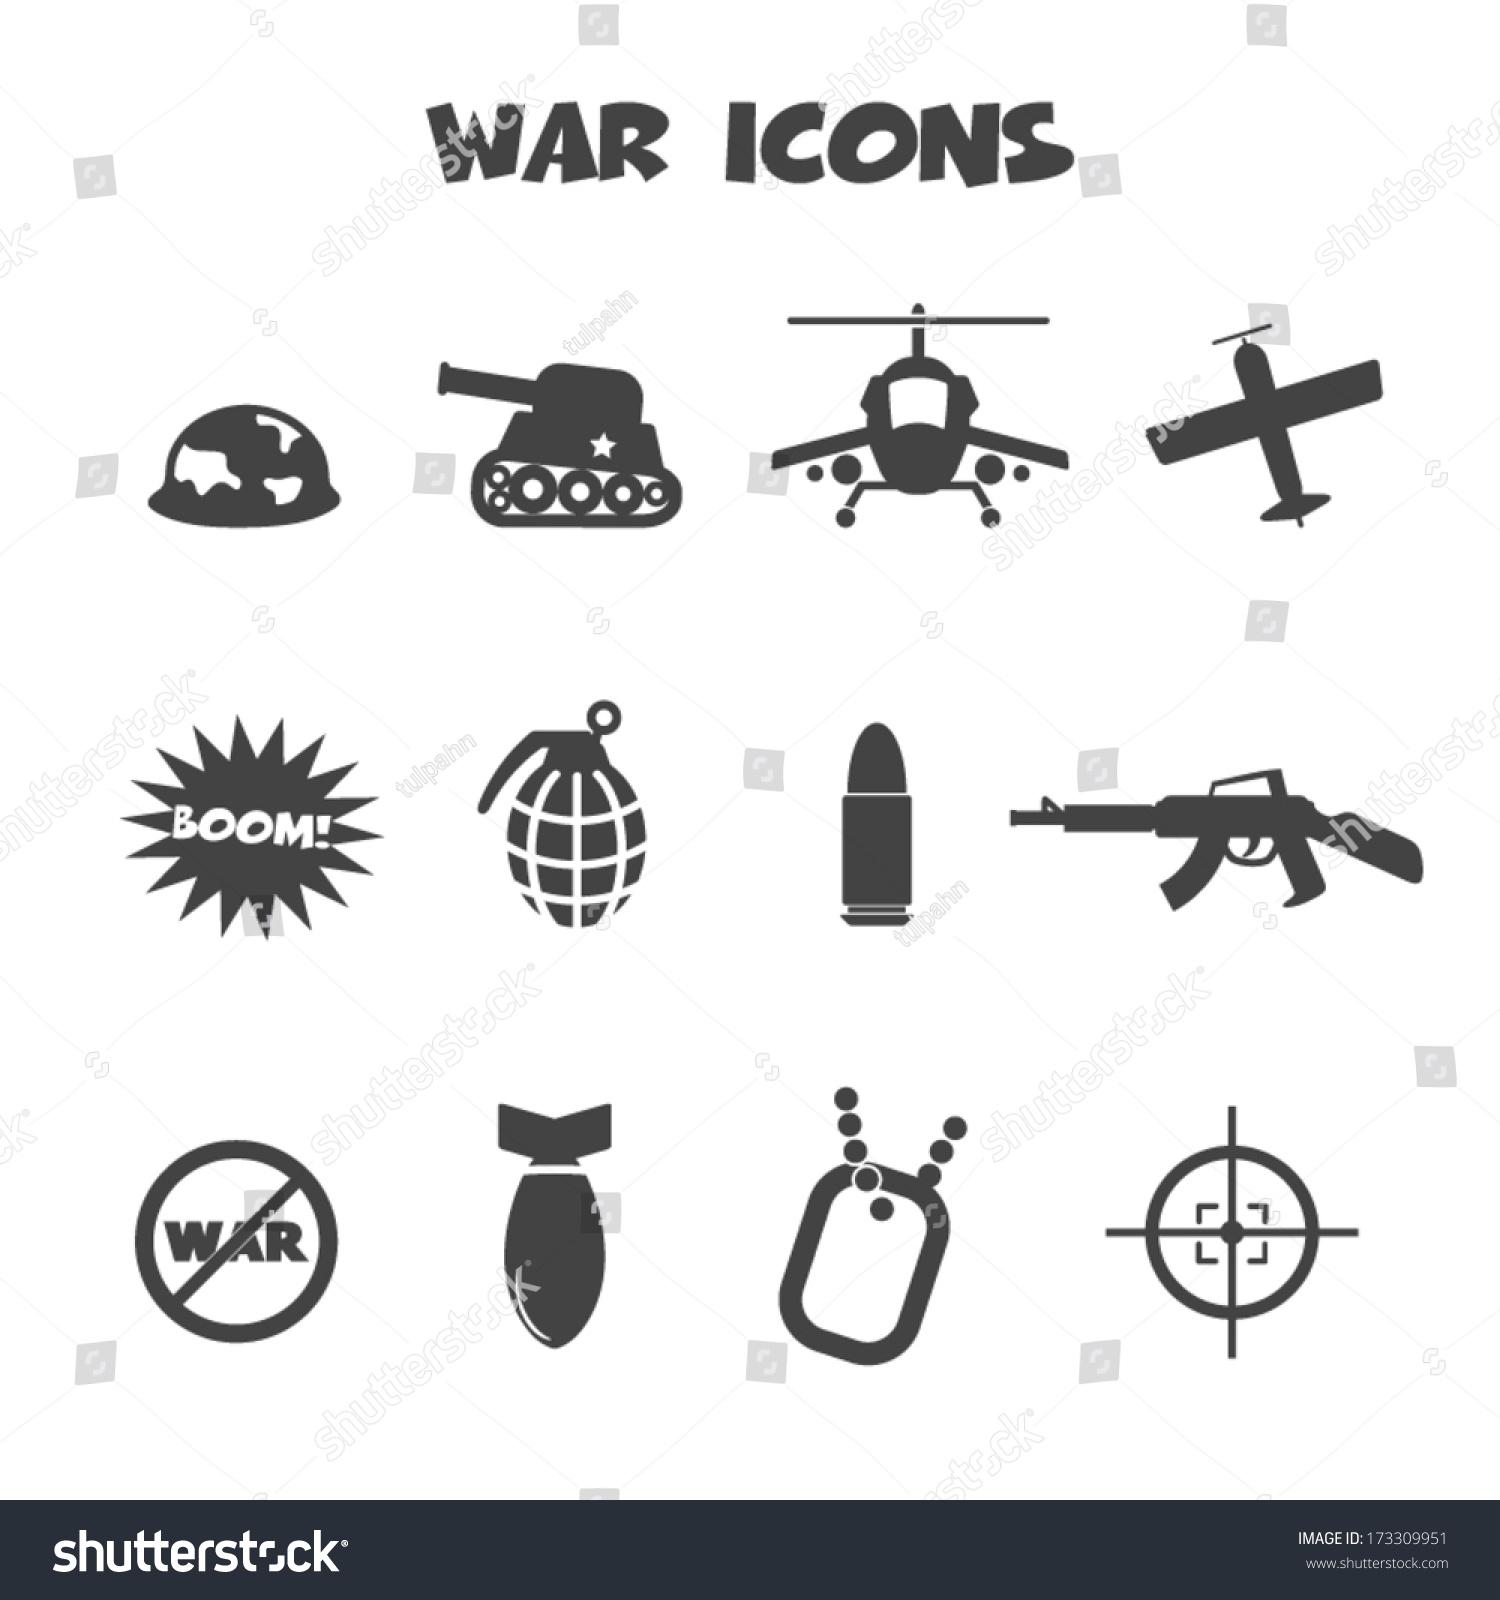 War icons mono vector symbols stock vector 173309951 shutterstock war icons mono vector symbols biocorpaavc Images